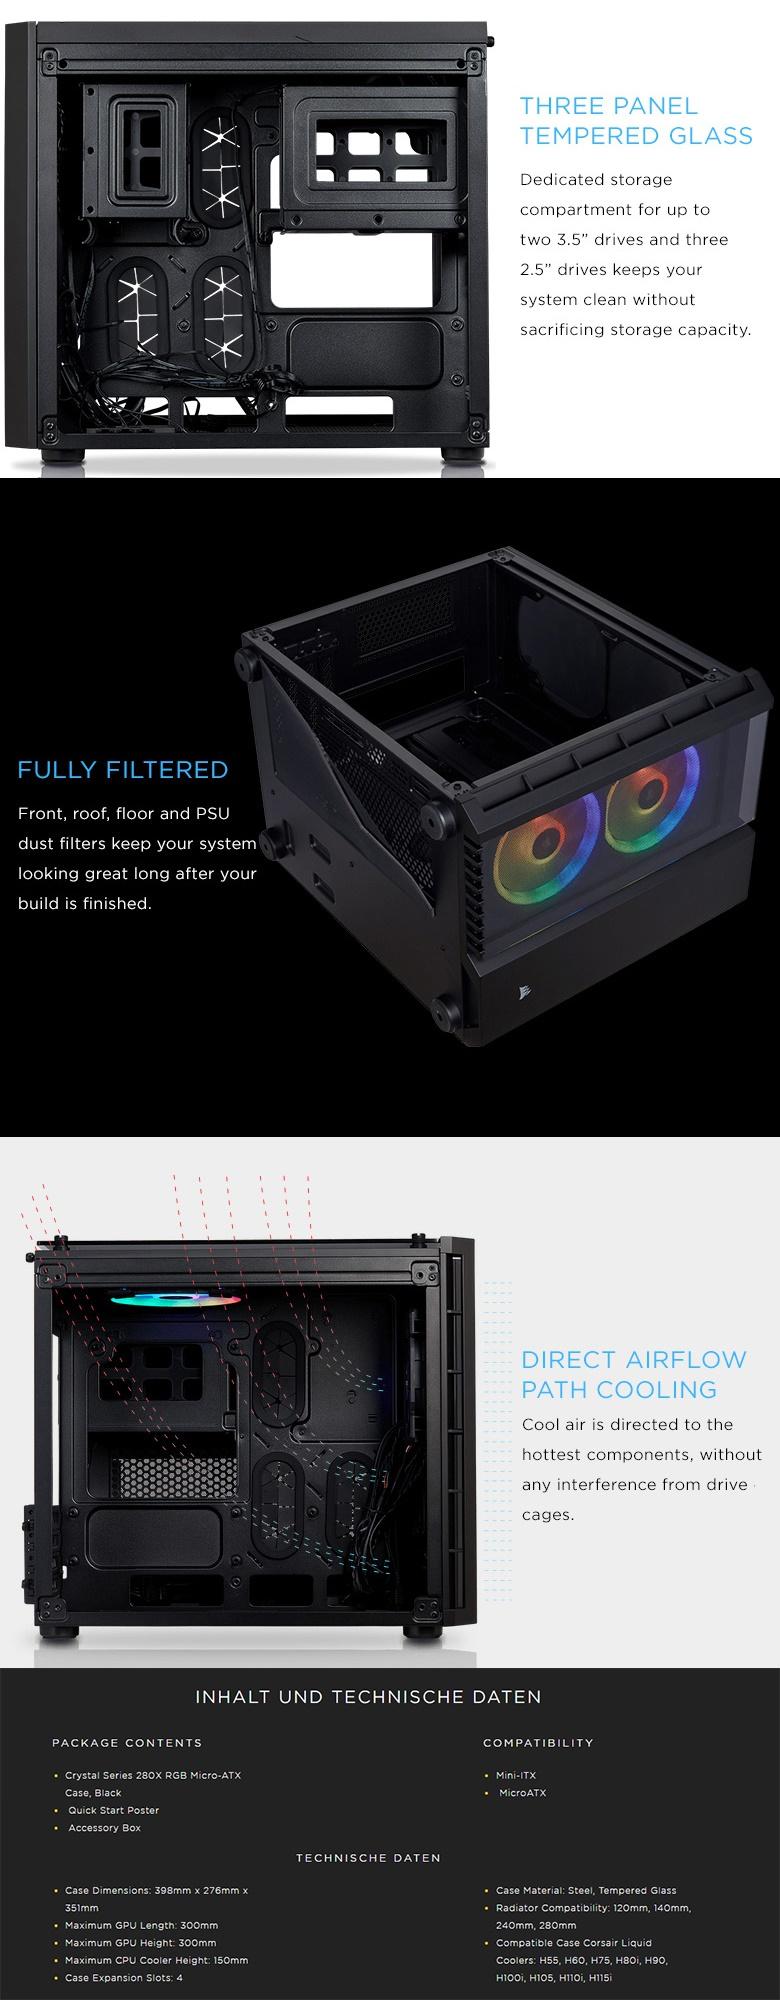 Corsair Crystal Series 280x Rgb Black Tempered Glass Micro Atx Computer Case Cc 9011135 Ww Video Pro Estore